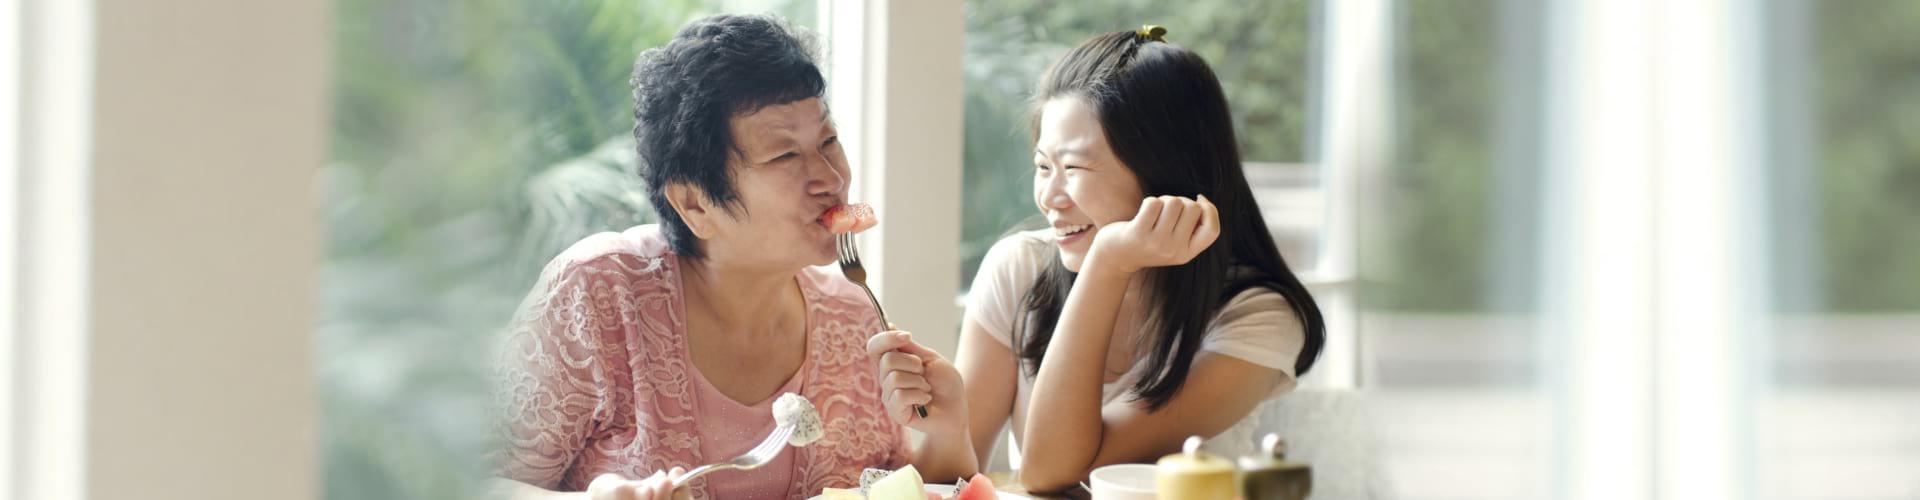 Asian adult daughter feeding fruit to senior mother